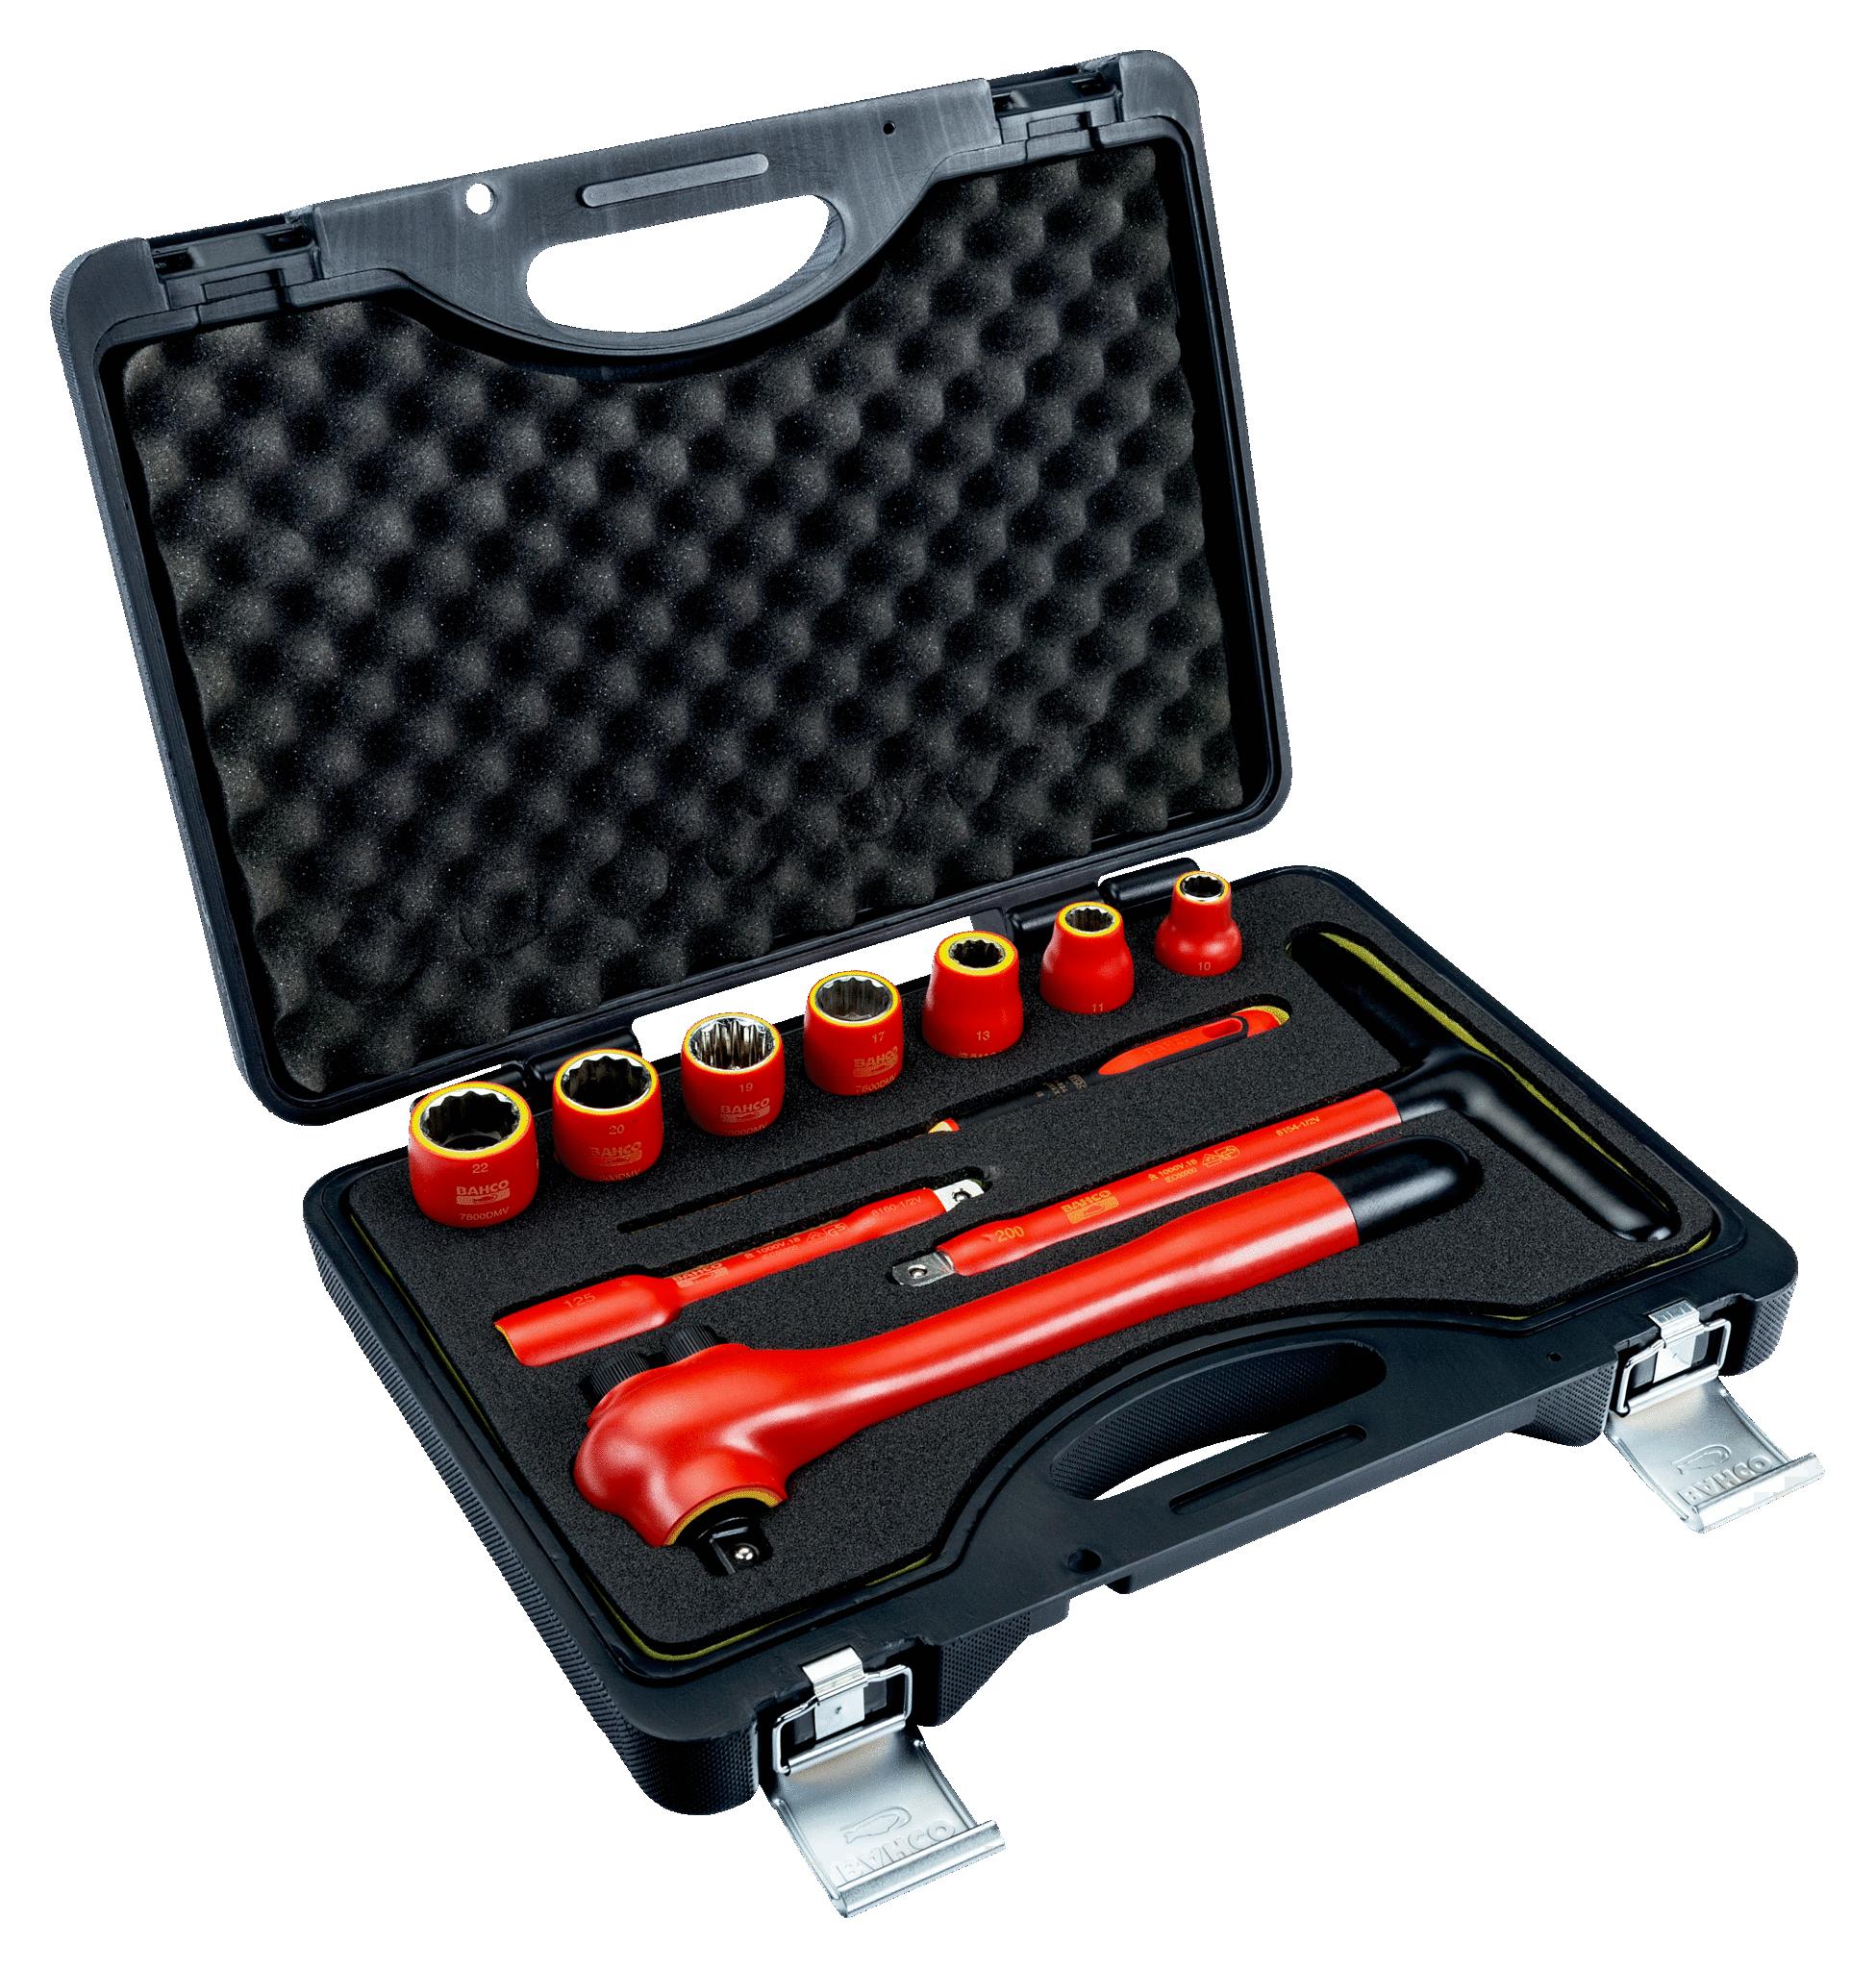 19mm Snap-On Industrial Brand BAHCO Bahco 7800DMV-20 1000V 1//2 Drive Socket